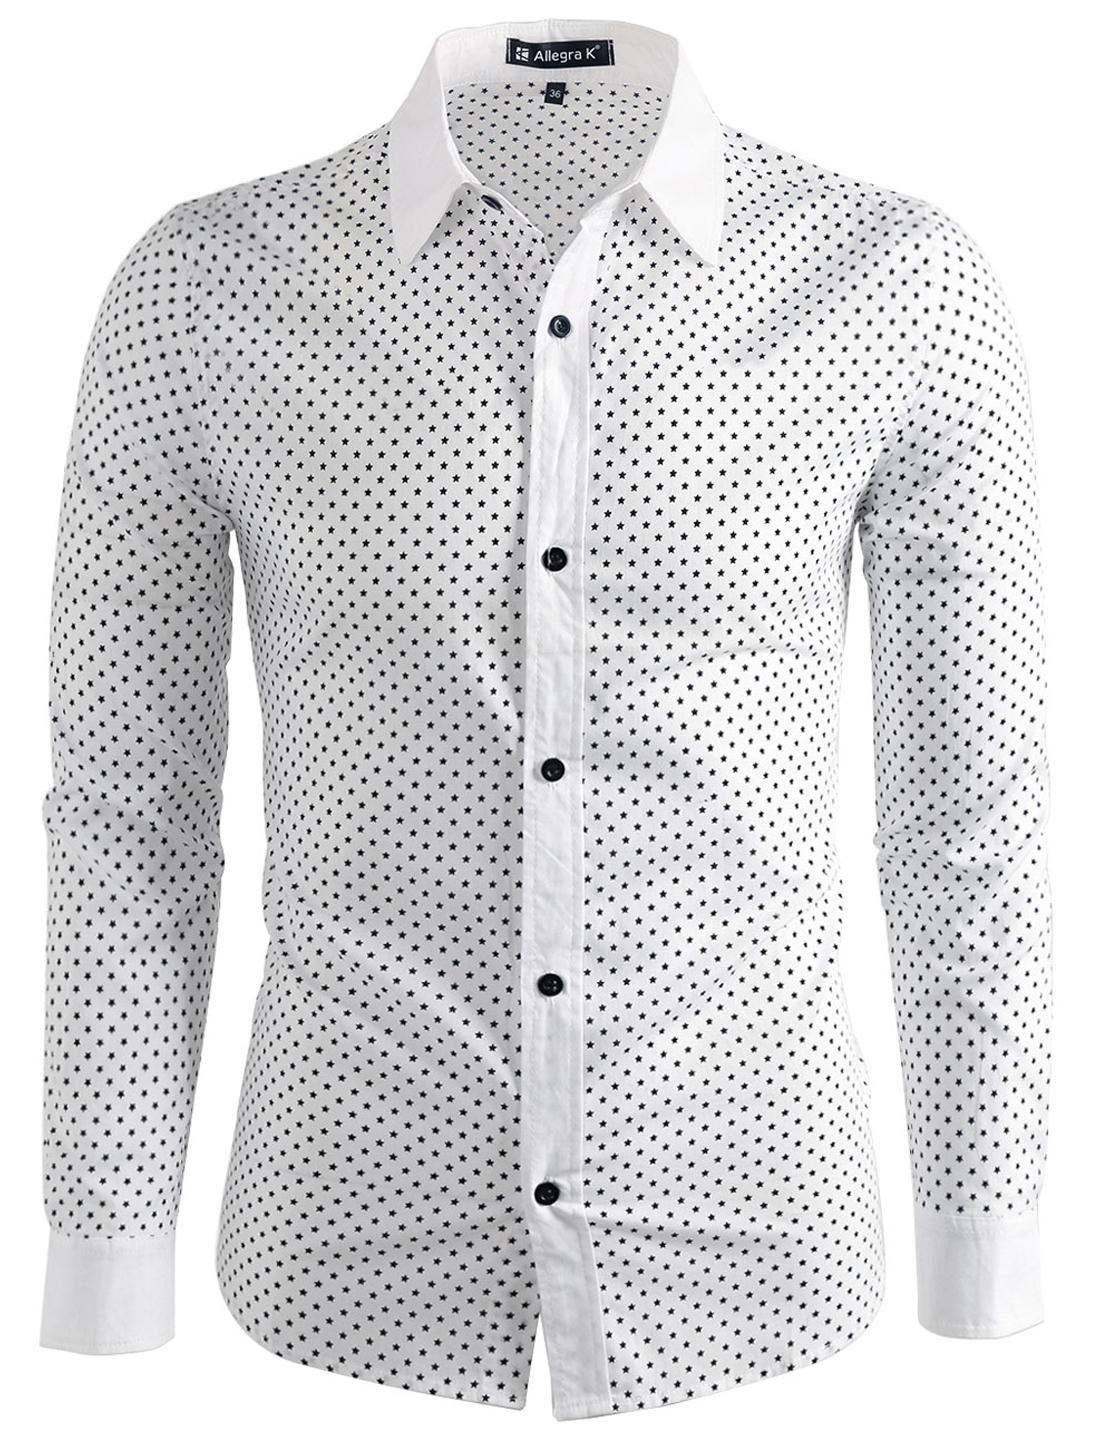 Men Allover Print Round Hem Button Down Slim Fit Long Sleeves Shirt White L